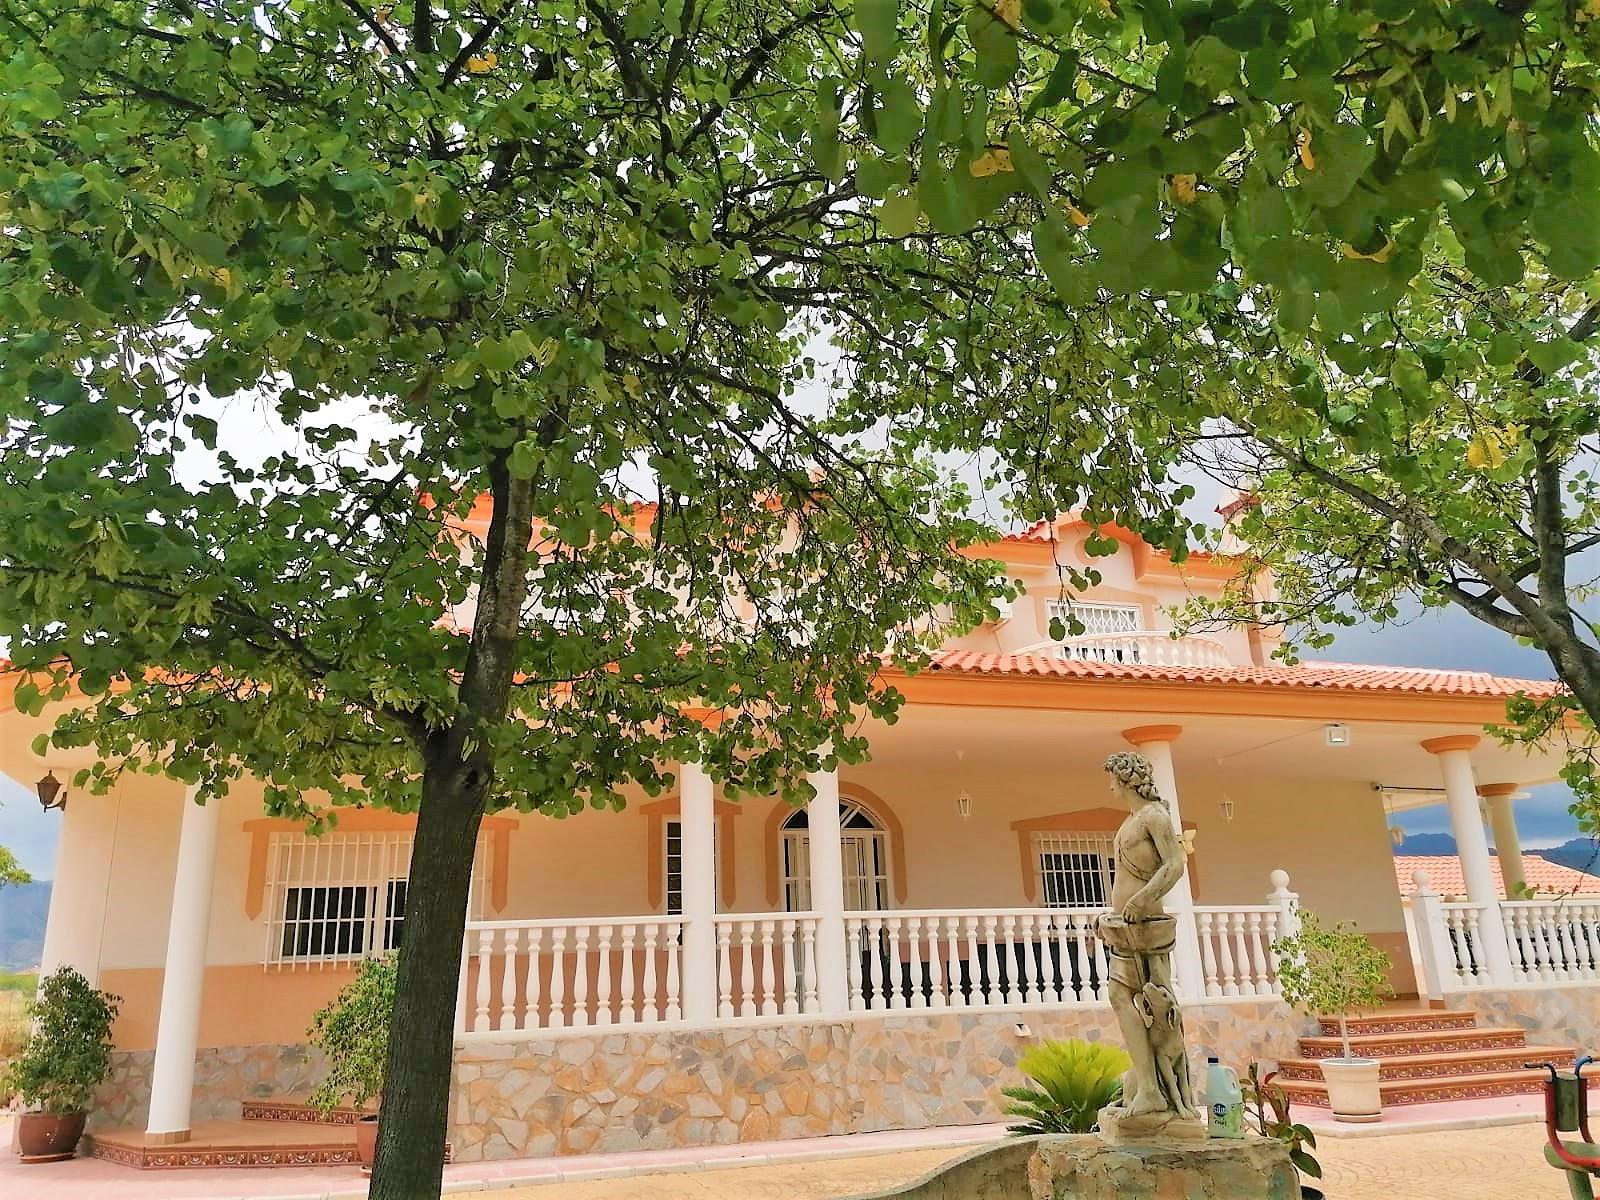 Maison - Murcia - #4134055-5